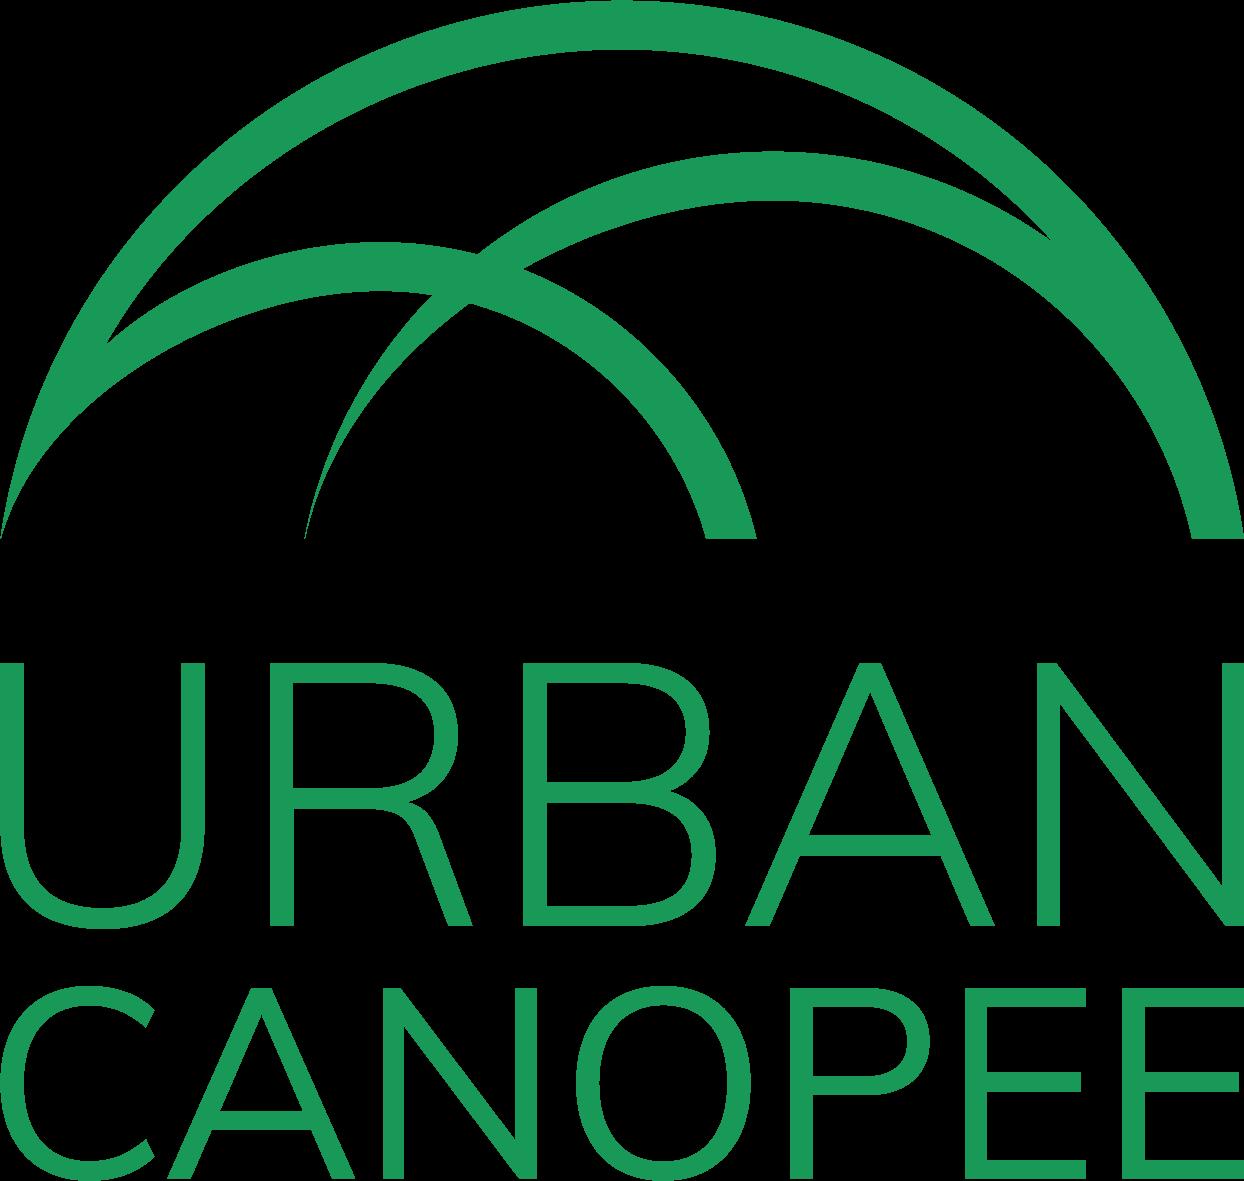 Urban Canopee